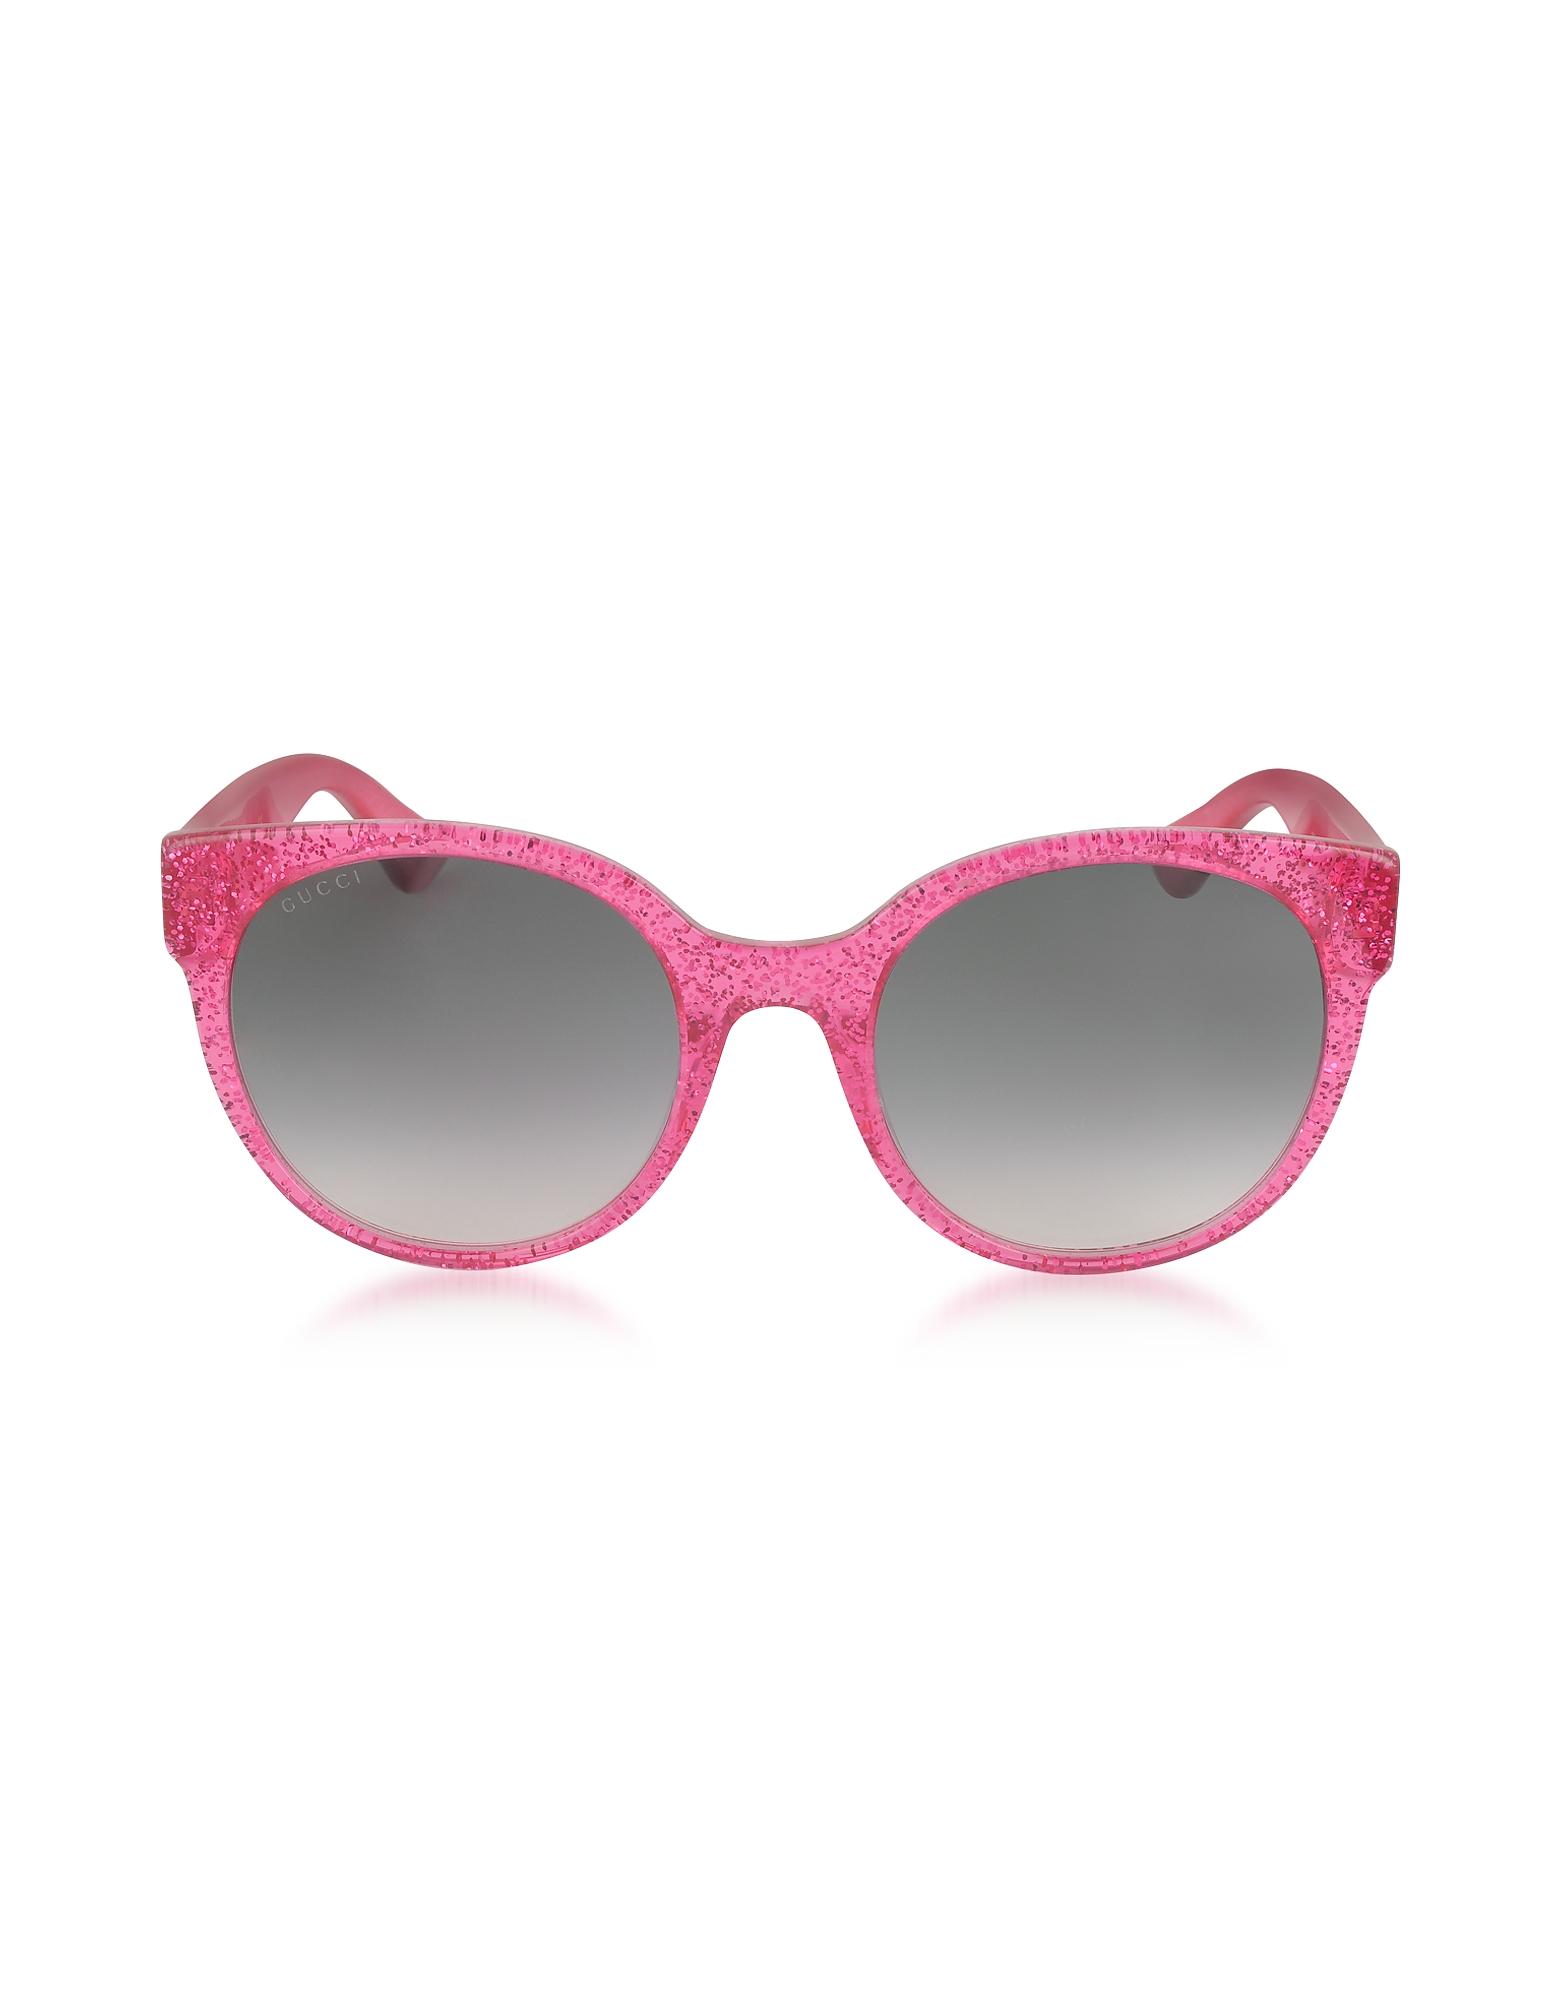 Gucci Sunglasses, GG0035S 005 Fuchsia Glitter Optyl Round Women's Sunglasses